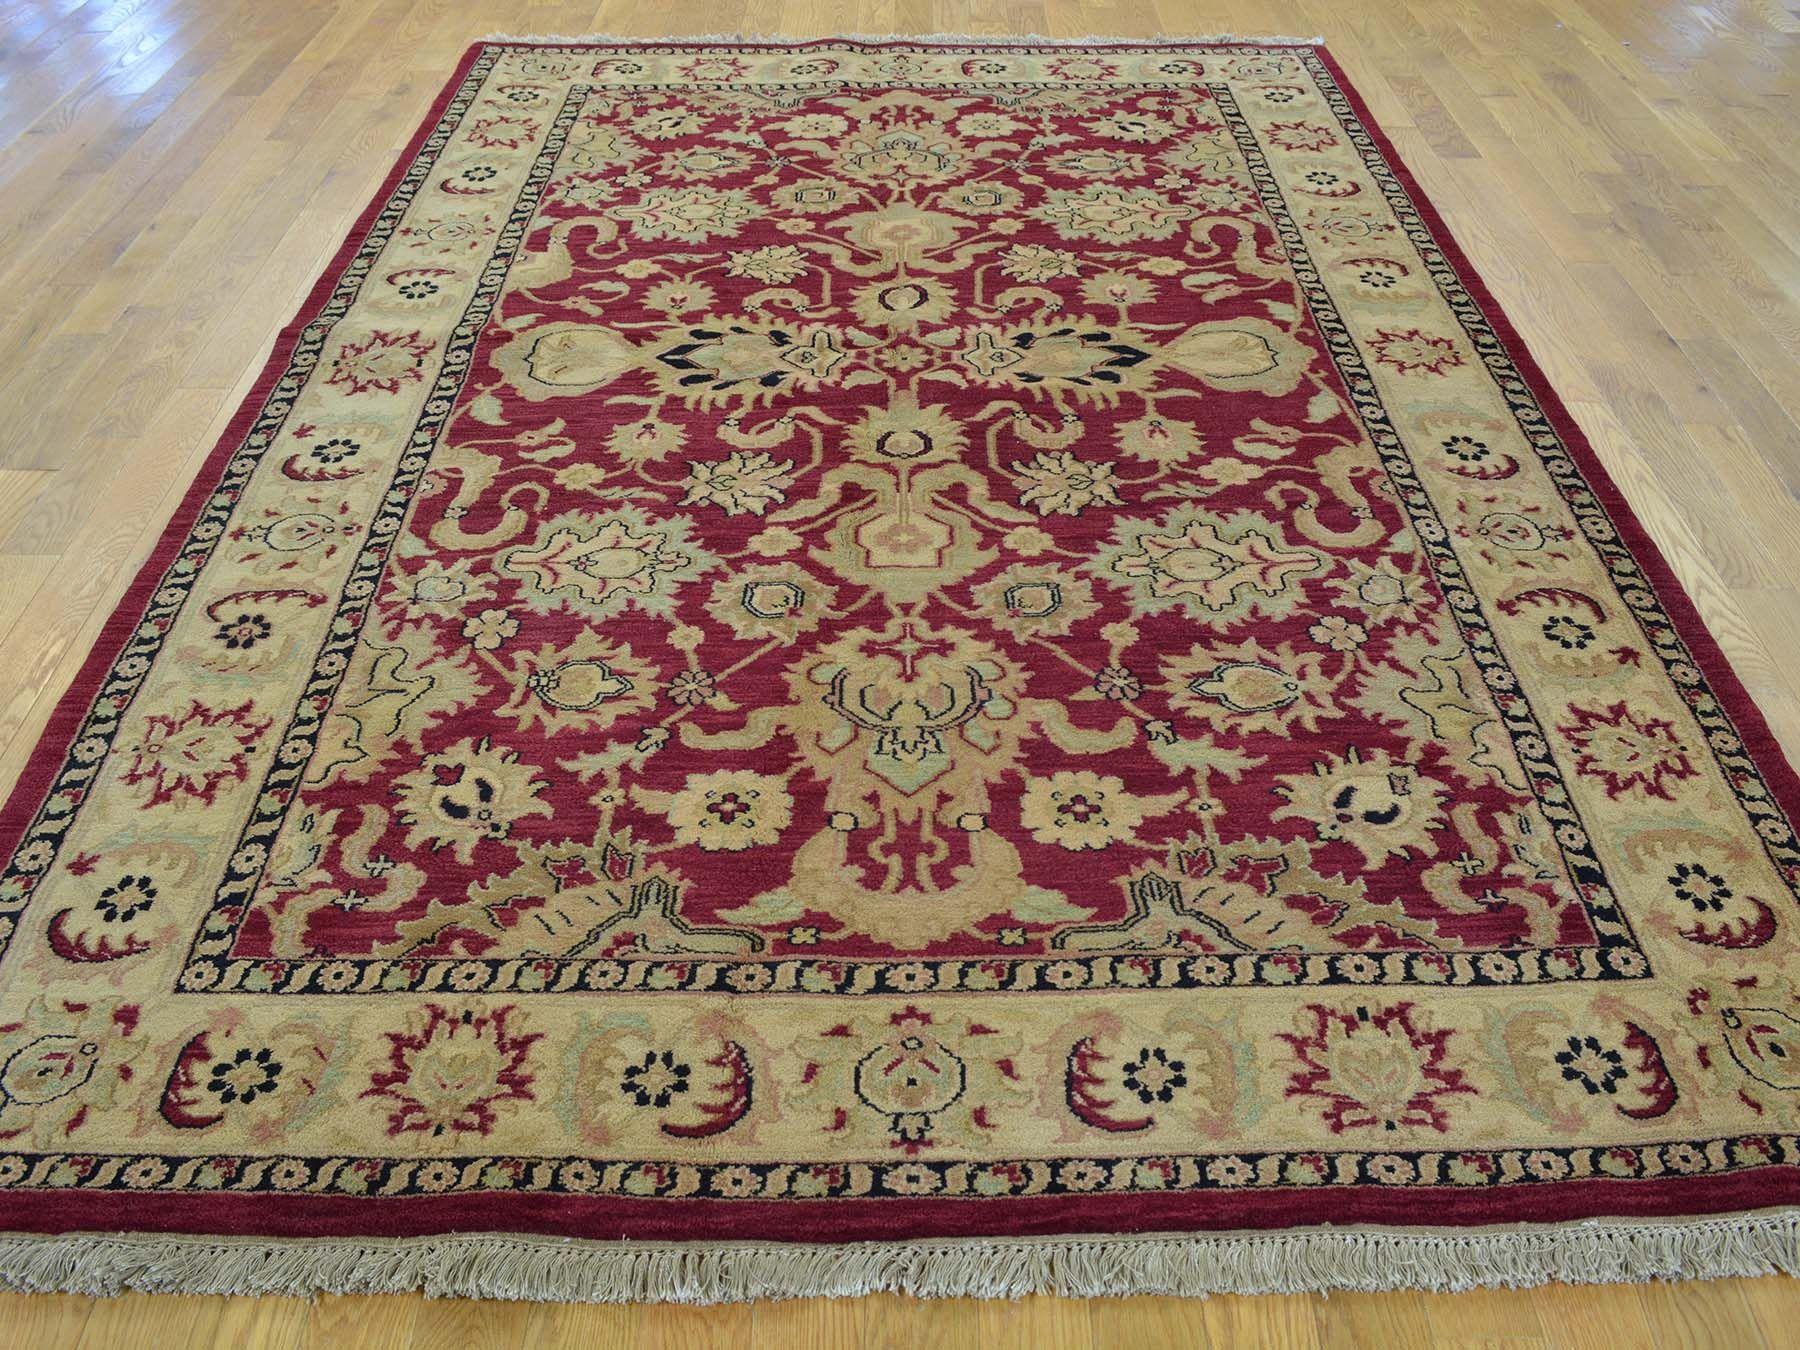 6 X 9 Burgundy Pure Wool Handmade Rajasthan Thick And